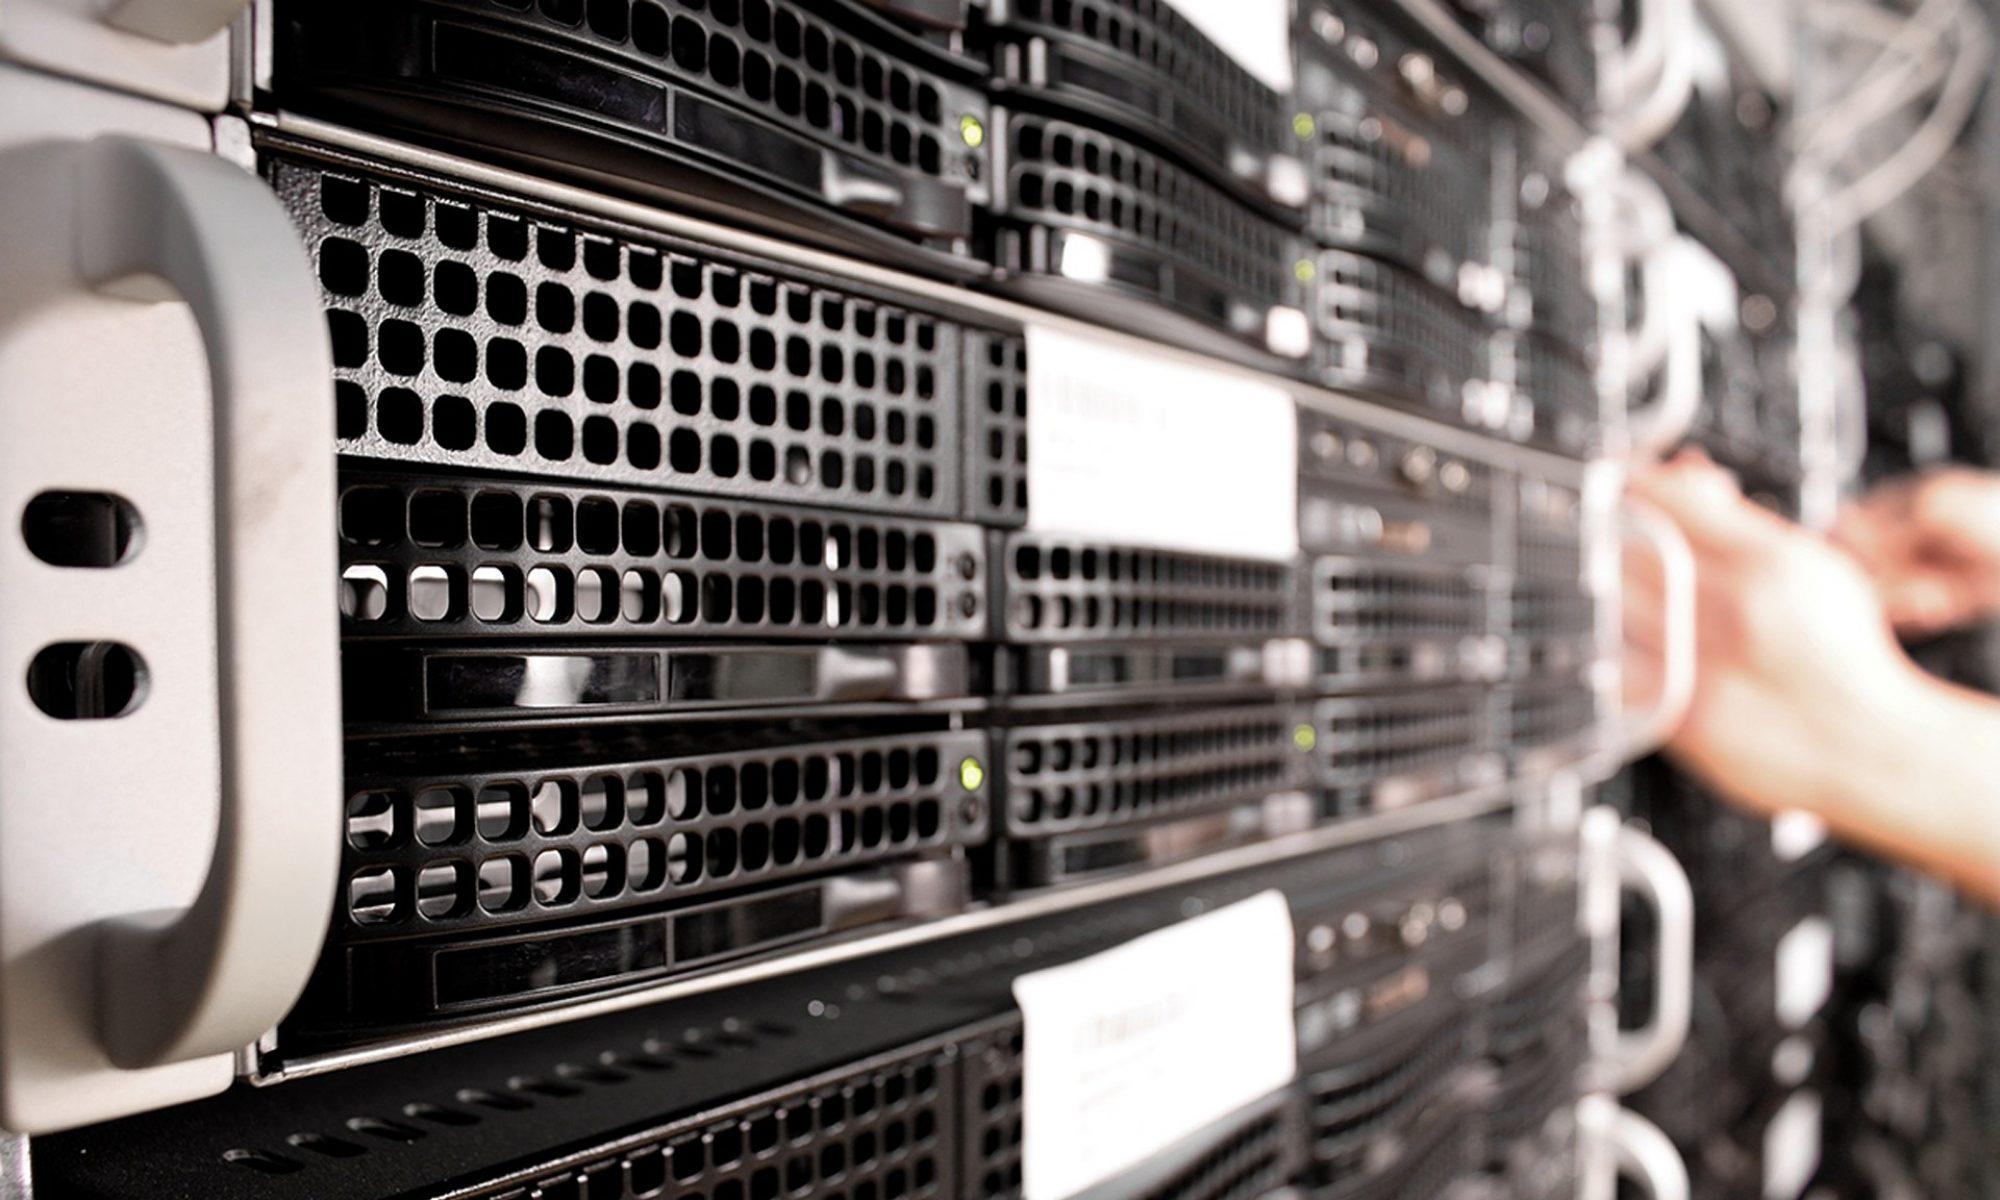 Opteamax - Netzwerke, Beratung, IP-Services